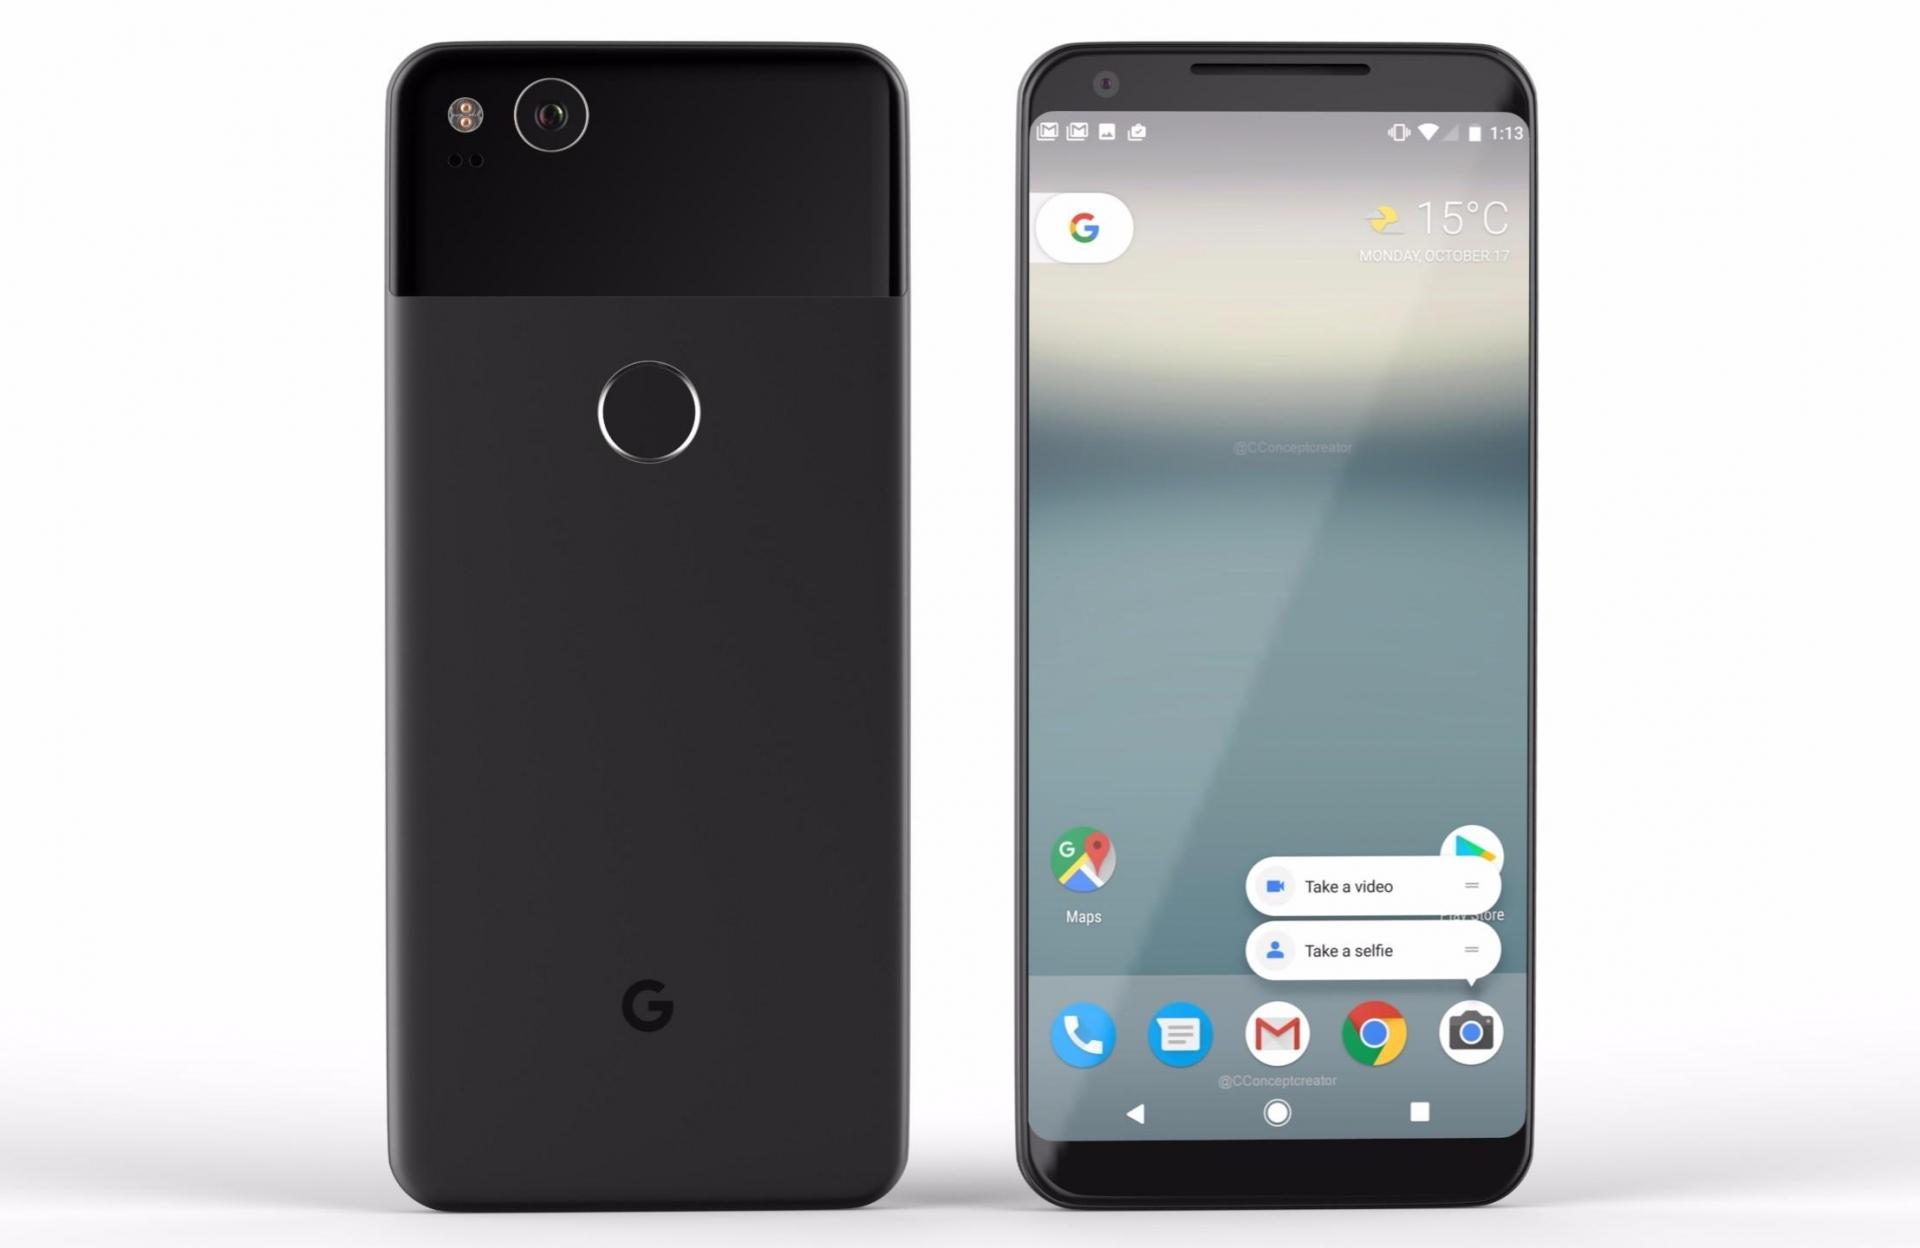 Google Leaked Details Of The Pixel 2 Smartphones